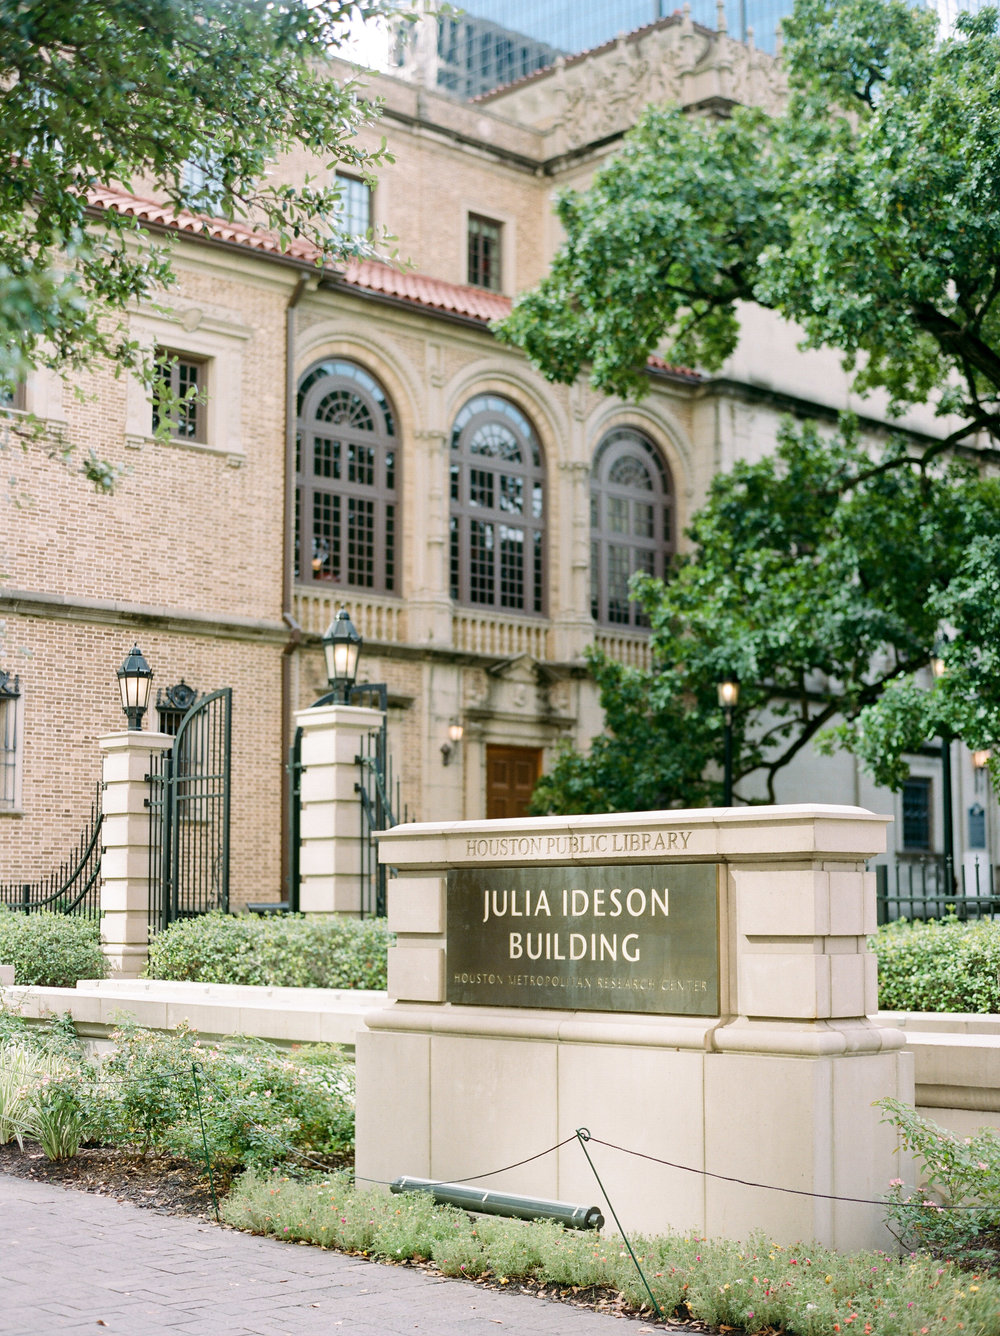 The-Knot-Texas-Fine-Art-Wedding-Film-Destination-Photographer-Houston-Austin-Dallas-New-Orleans-Julia-Ideson-Library-Event-Dana-Josh-Fernandez-Photograph-Top-Best-56.jpg